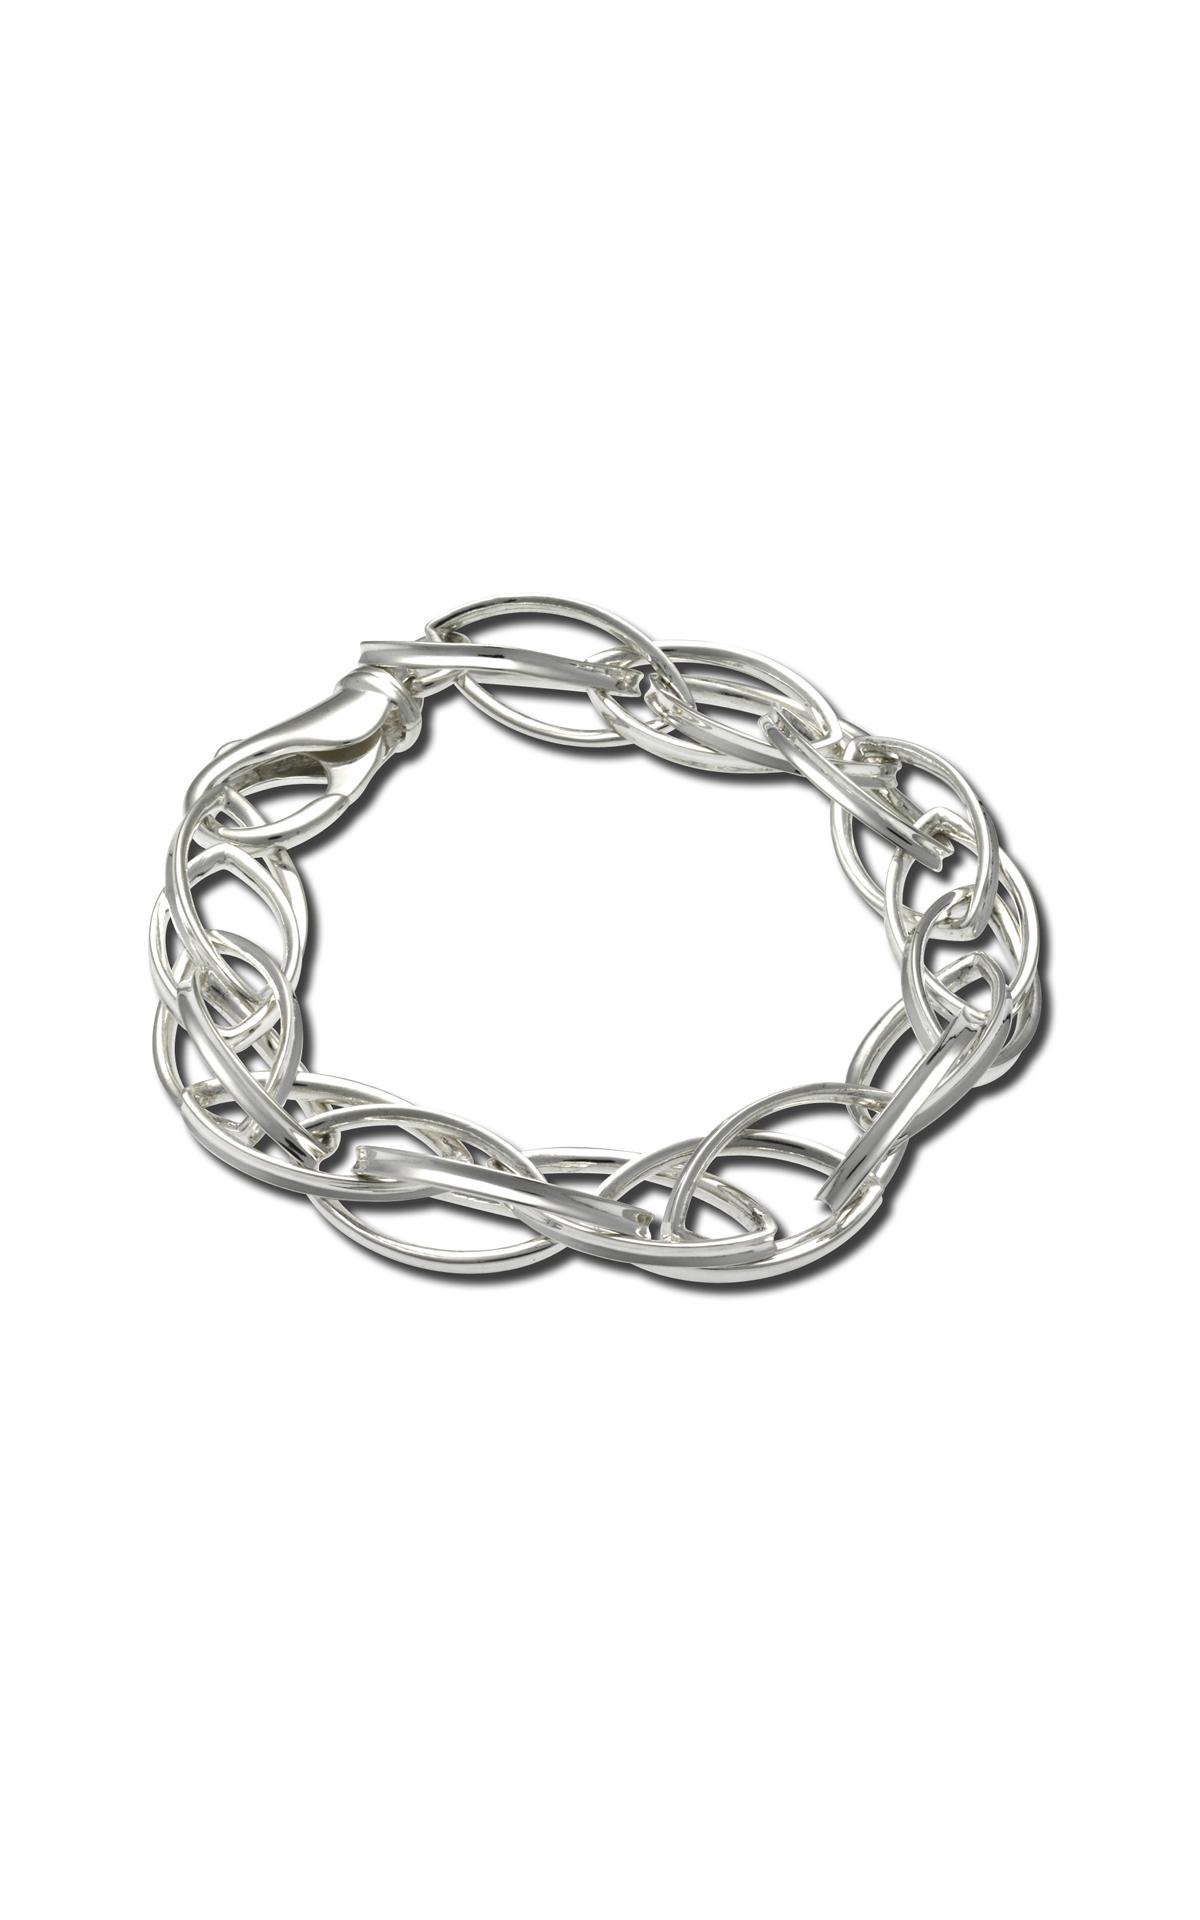 Zina Contemporary Bracelet A868-7 product image